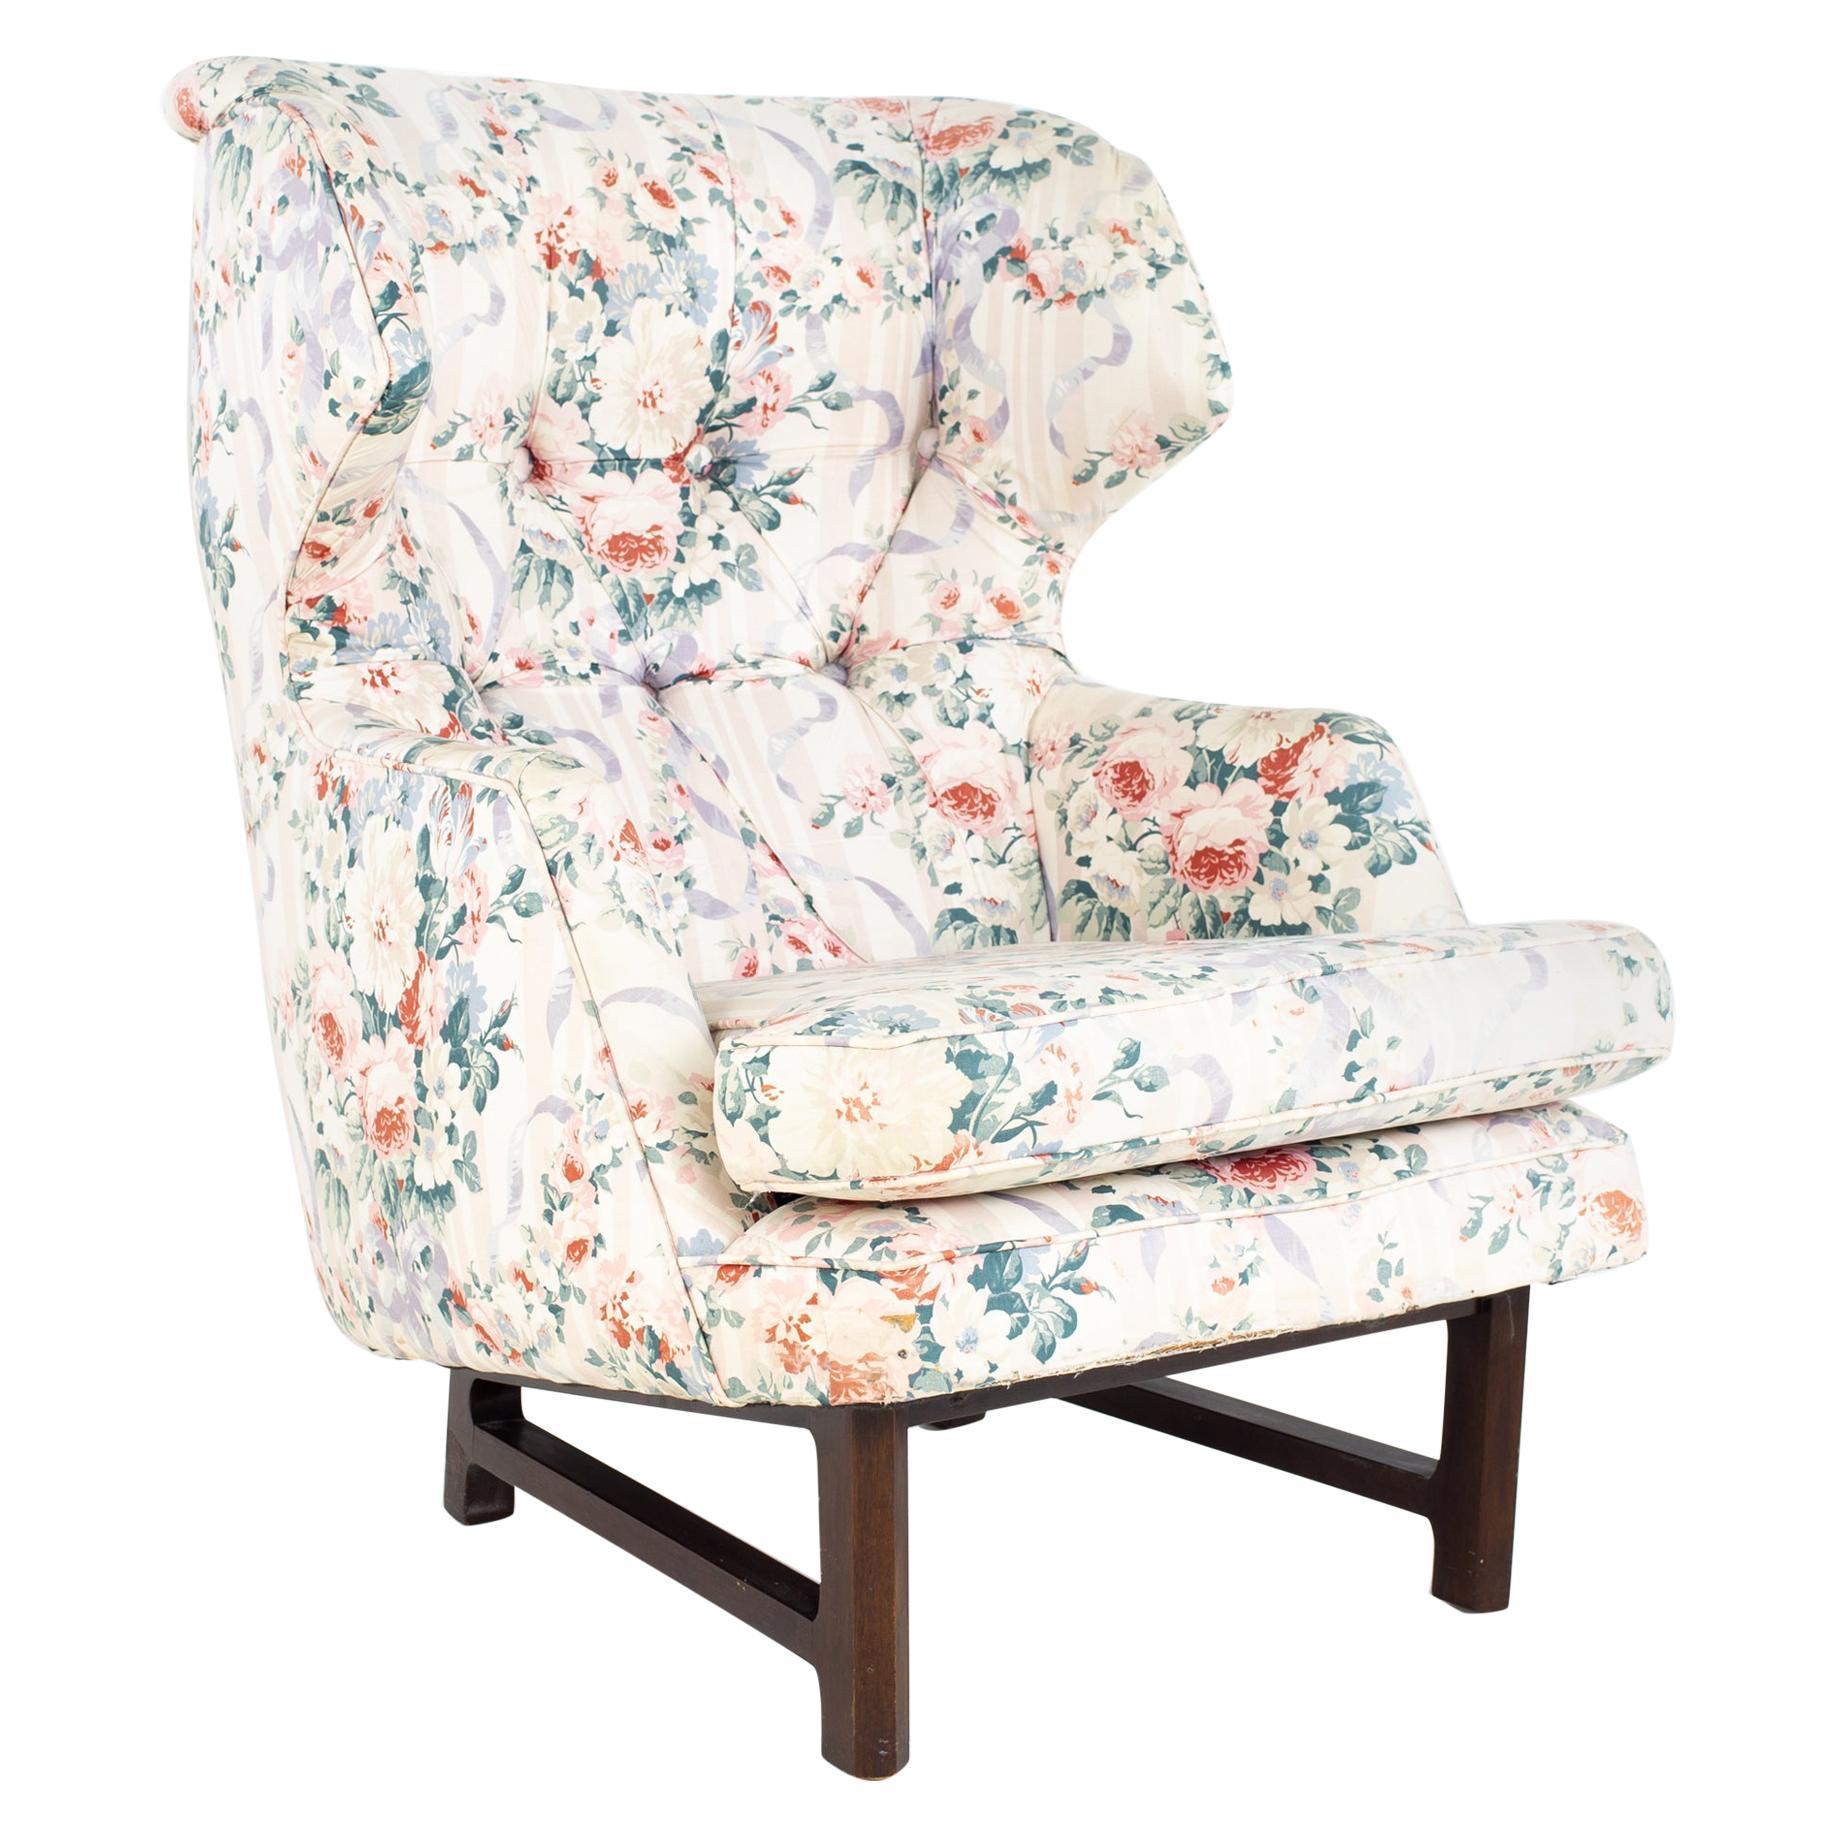 Edward Wormley for Dunbar Janus Model 5761 Mid Century Wingback Lounge Chair